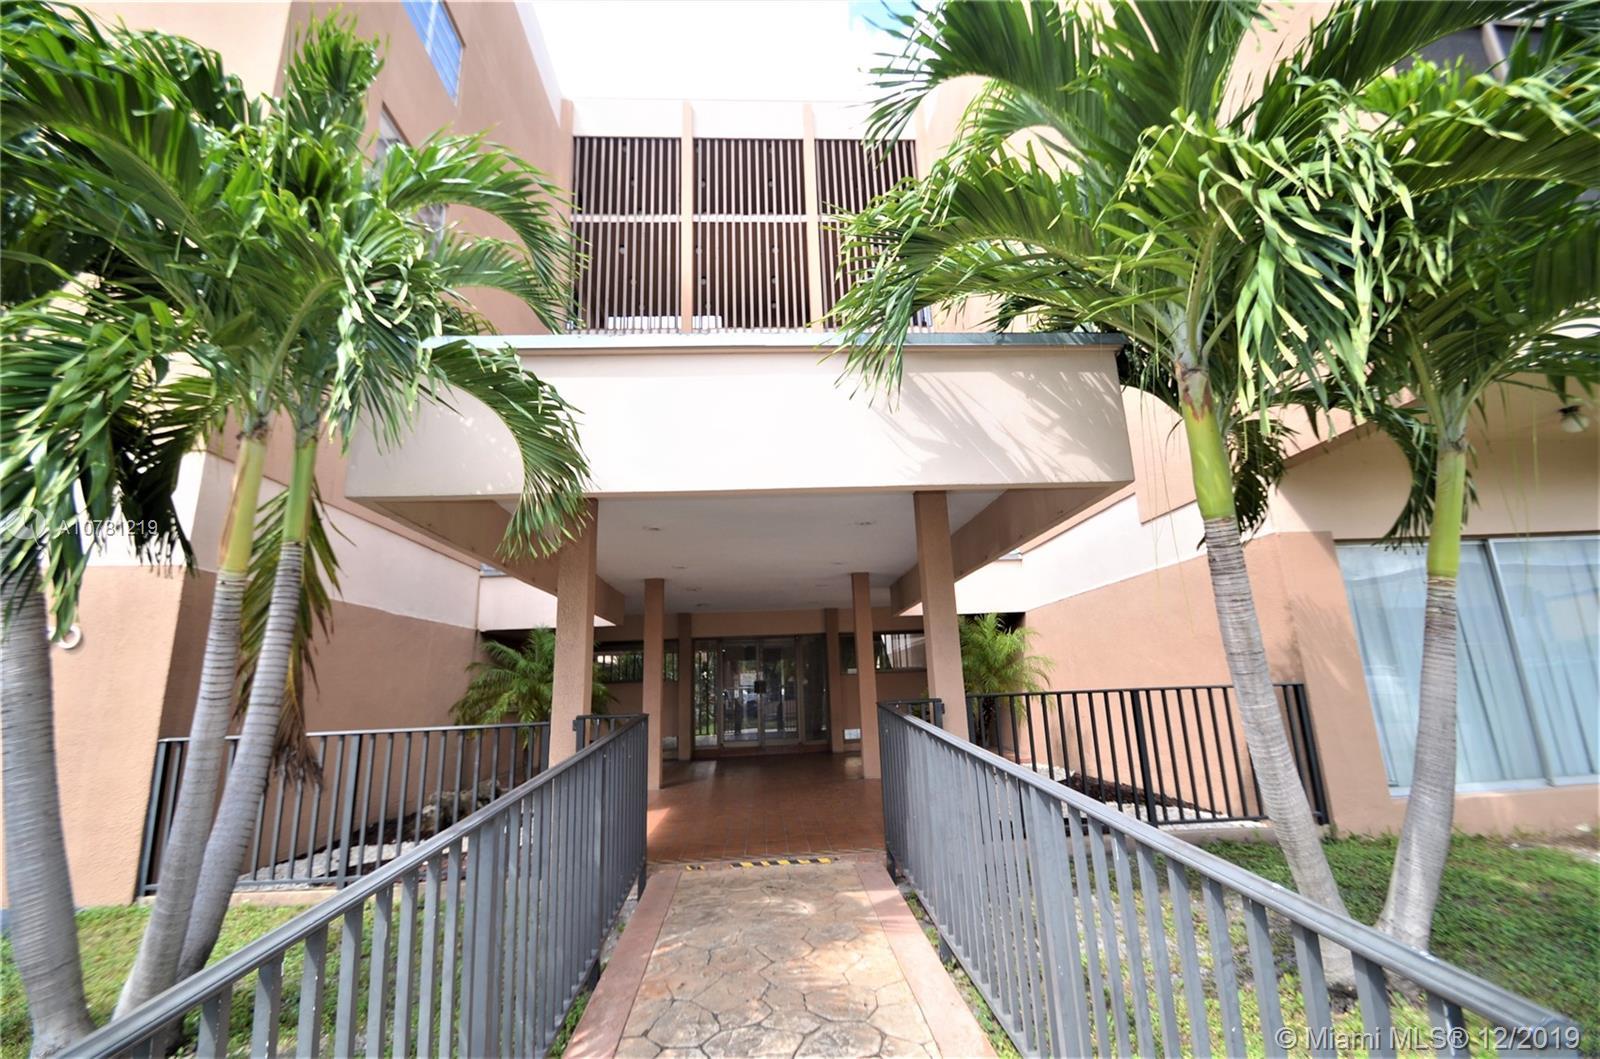 4670 W 13th Ln, 508 - Hialeah, Florida